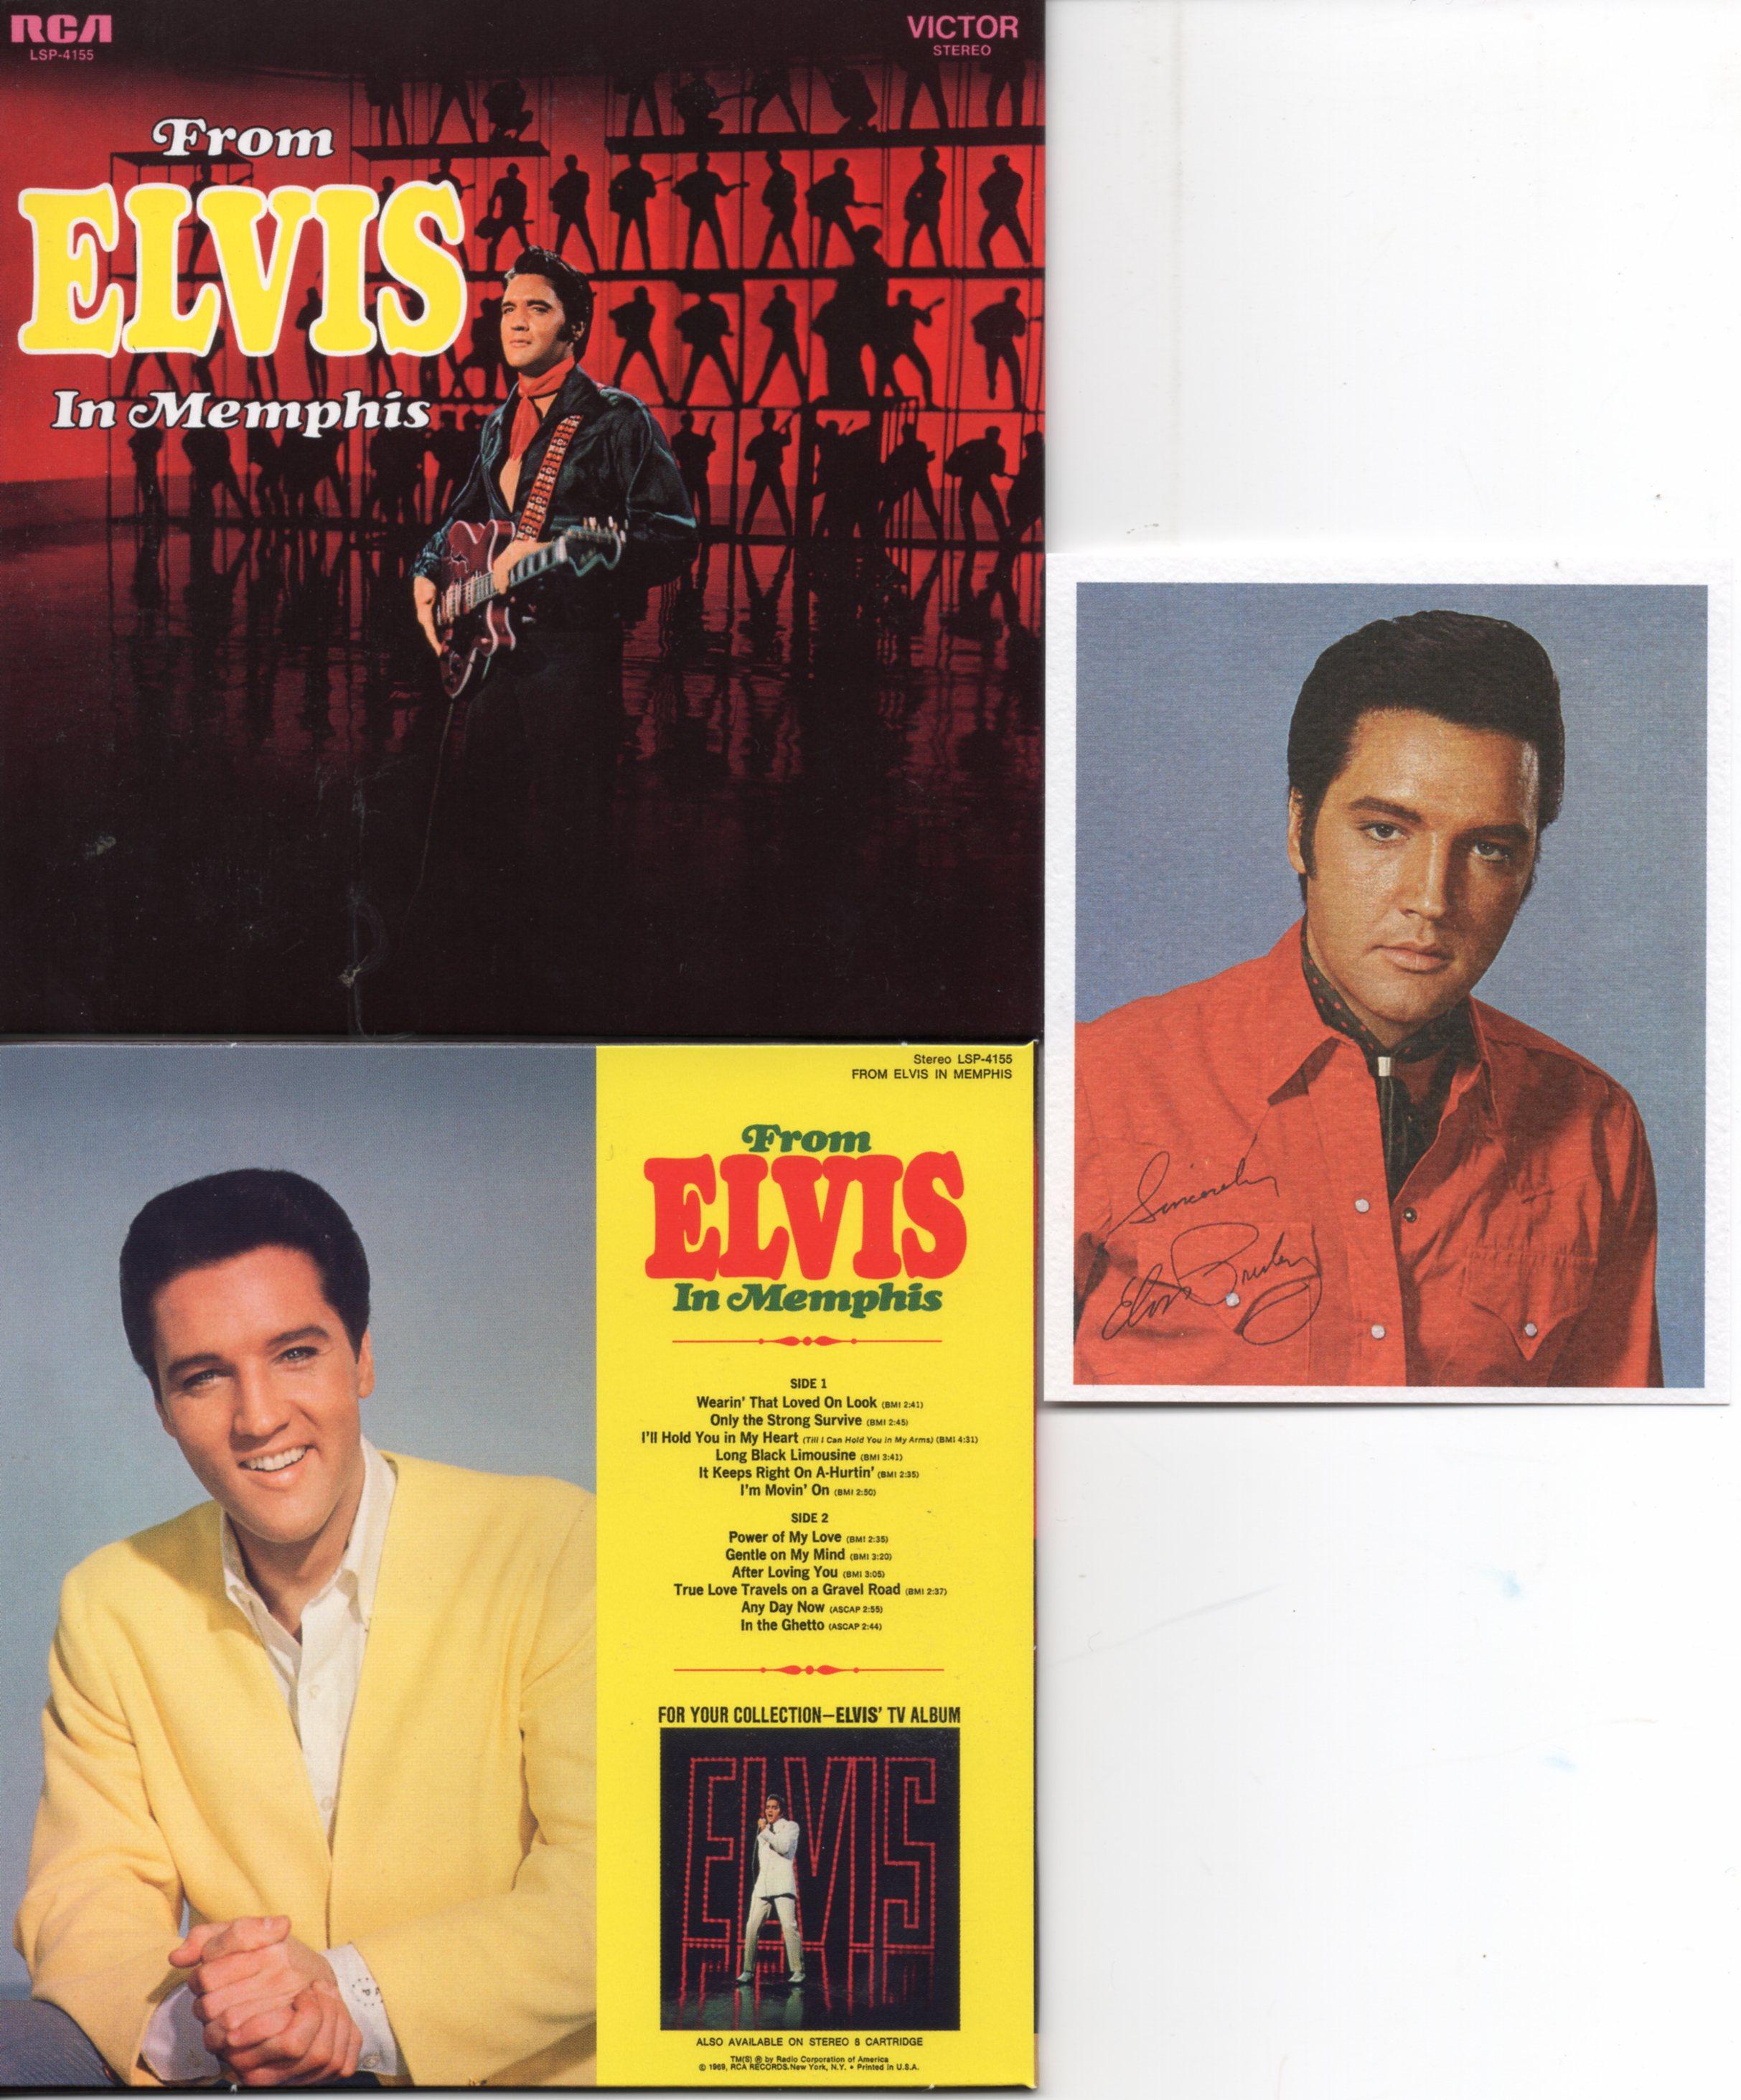 Elvis PRESLEY - From Elvis In Memphis (1969 - Mini Lp Replica - 16-track Card Sleeve Inc Photo)